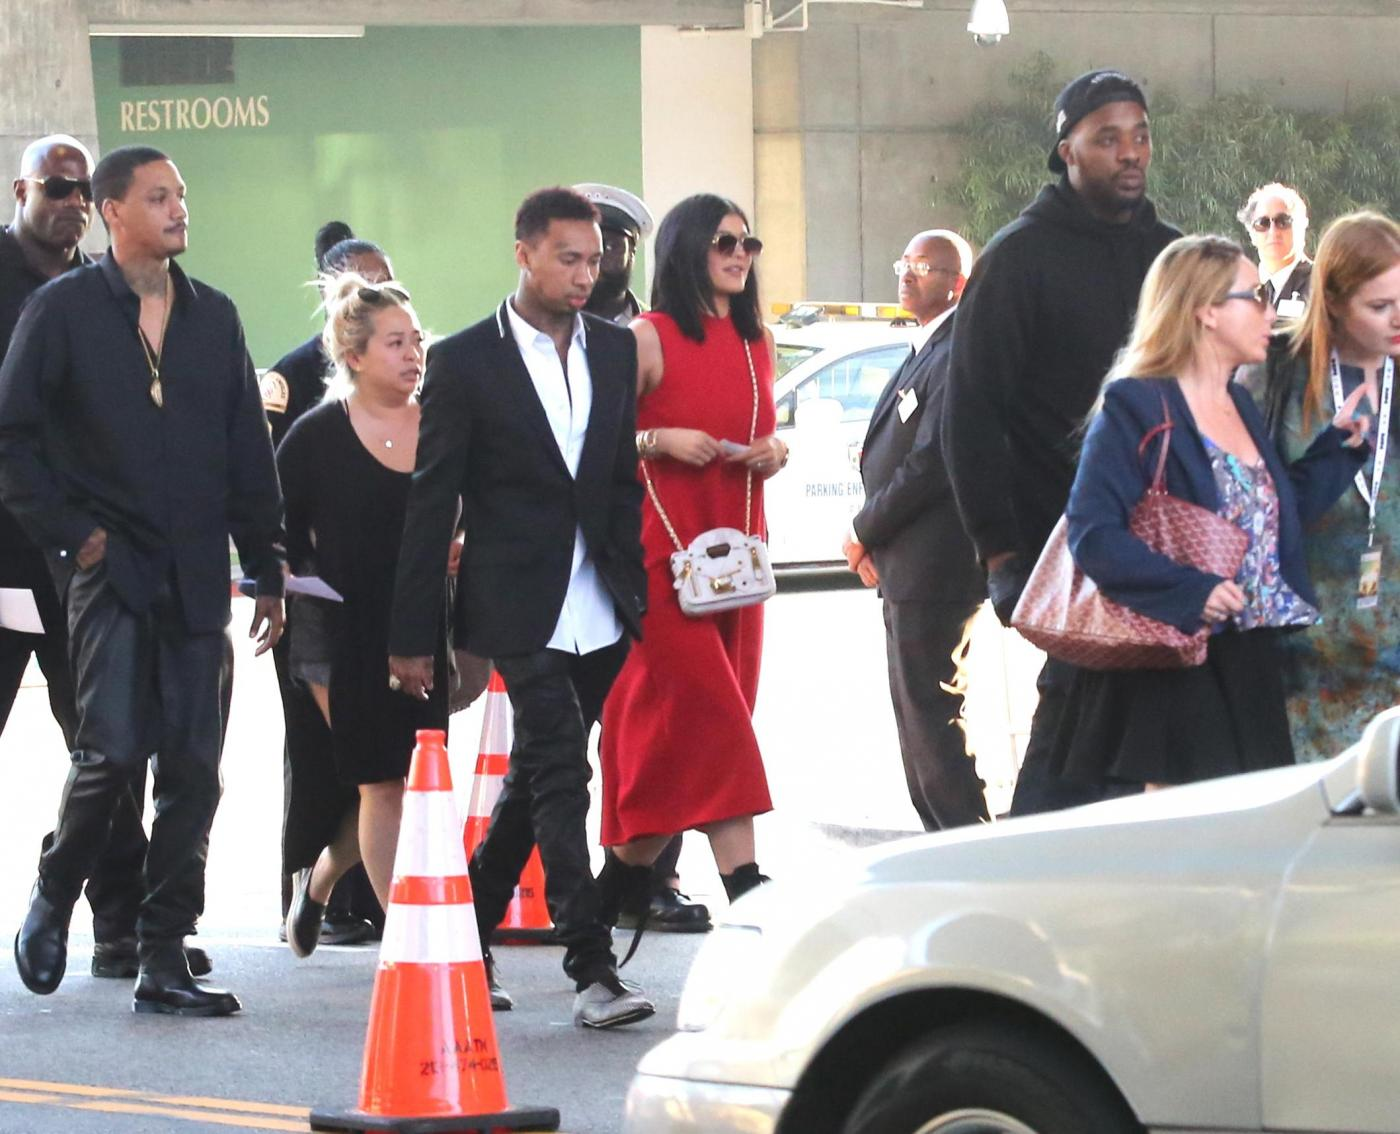 Kylie Jenner insieme al fidanzato Tyga FOTO 14